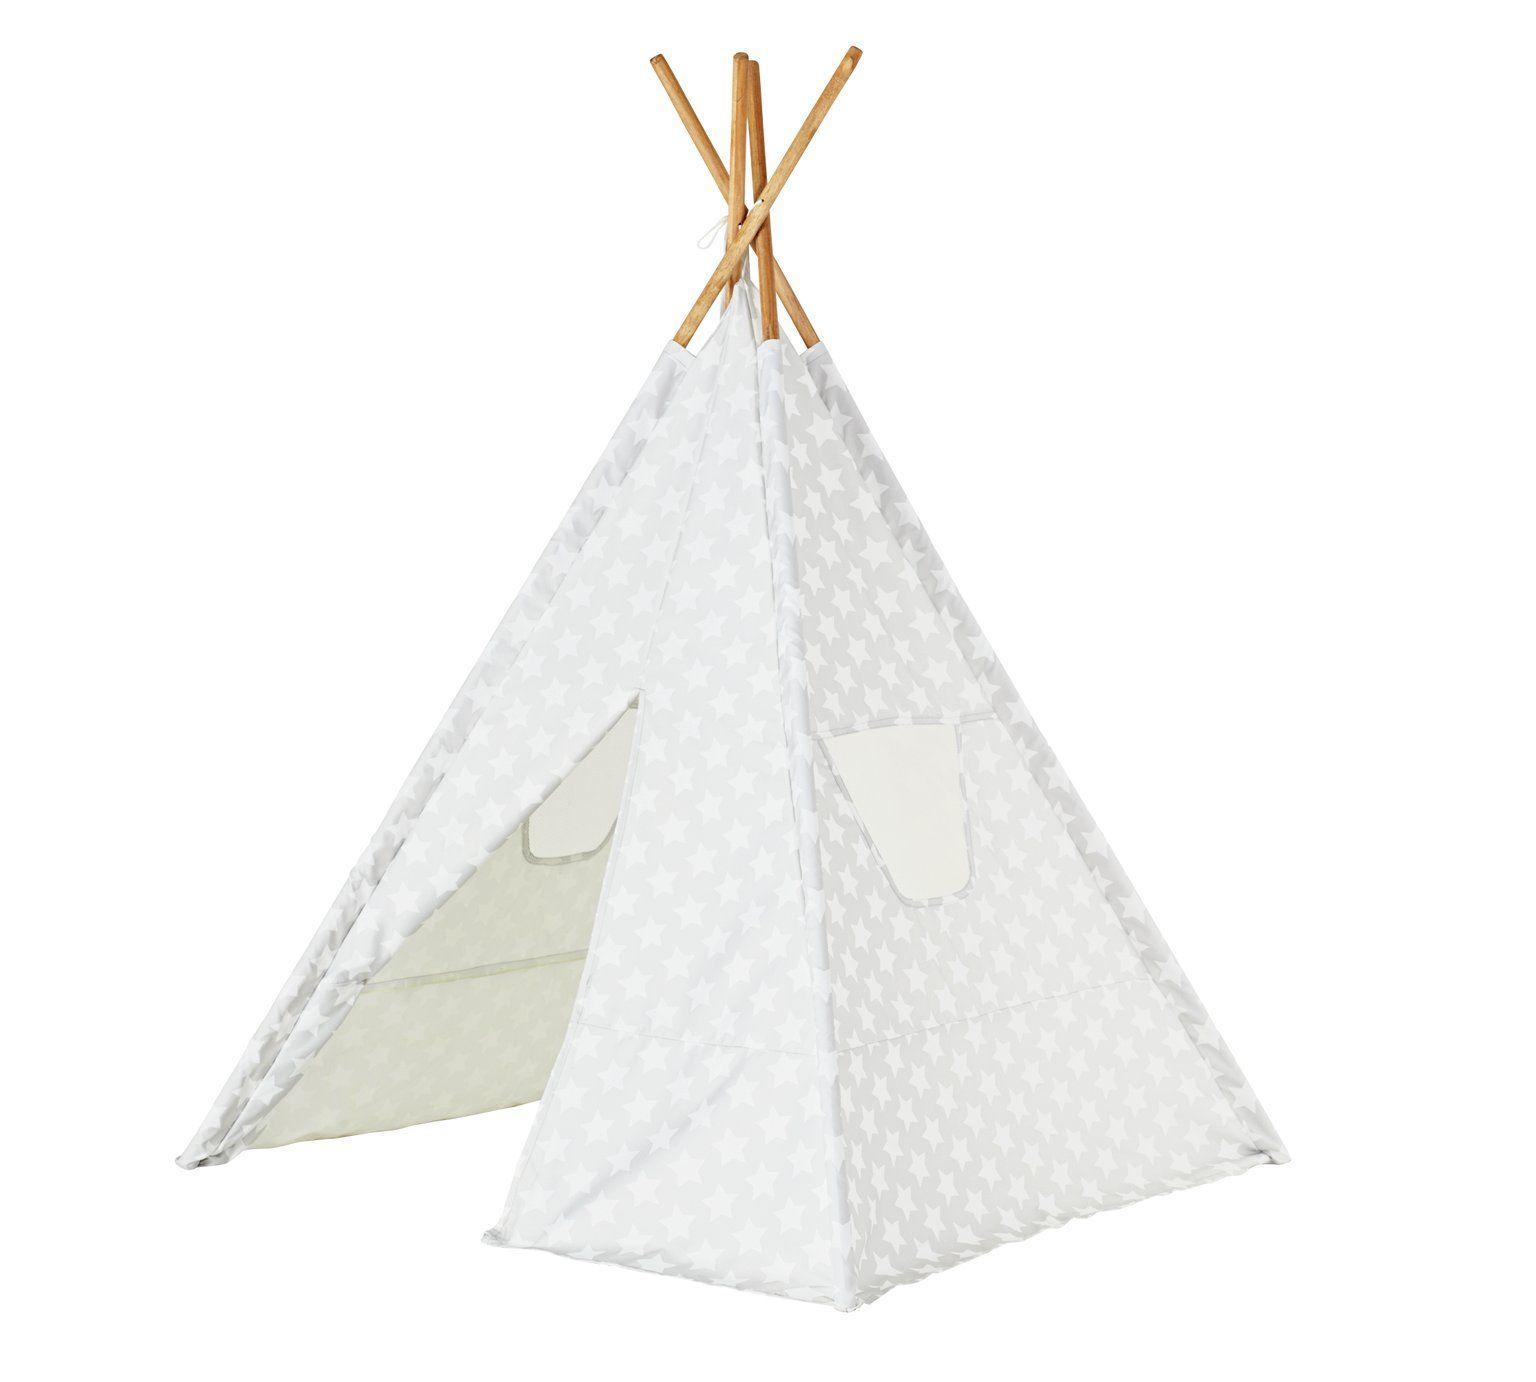 Buy Kaikoo Kids Play Teepee Tent  Silver At Argoscouk,